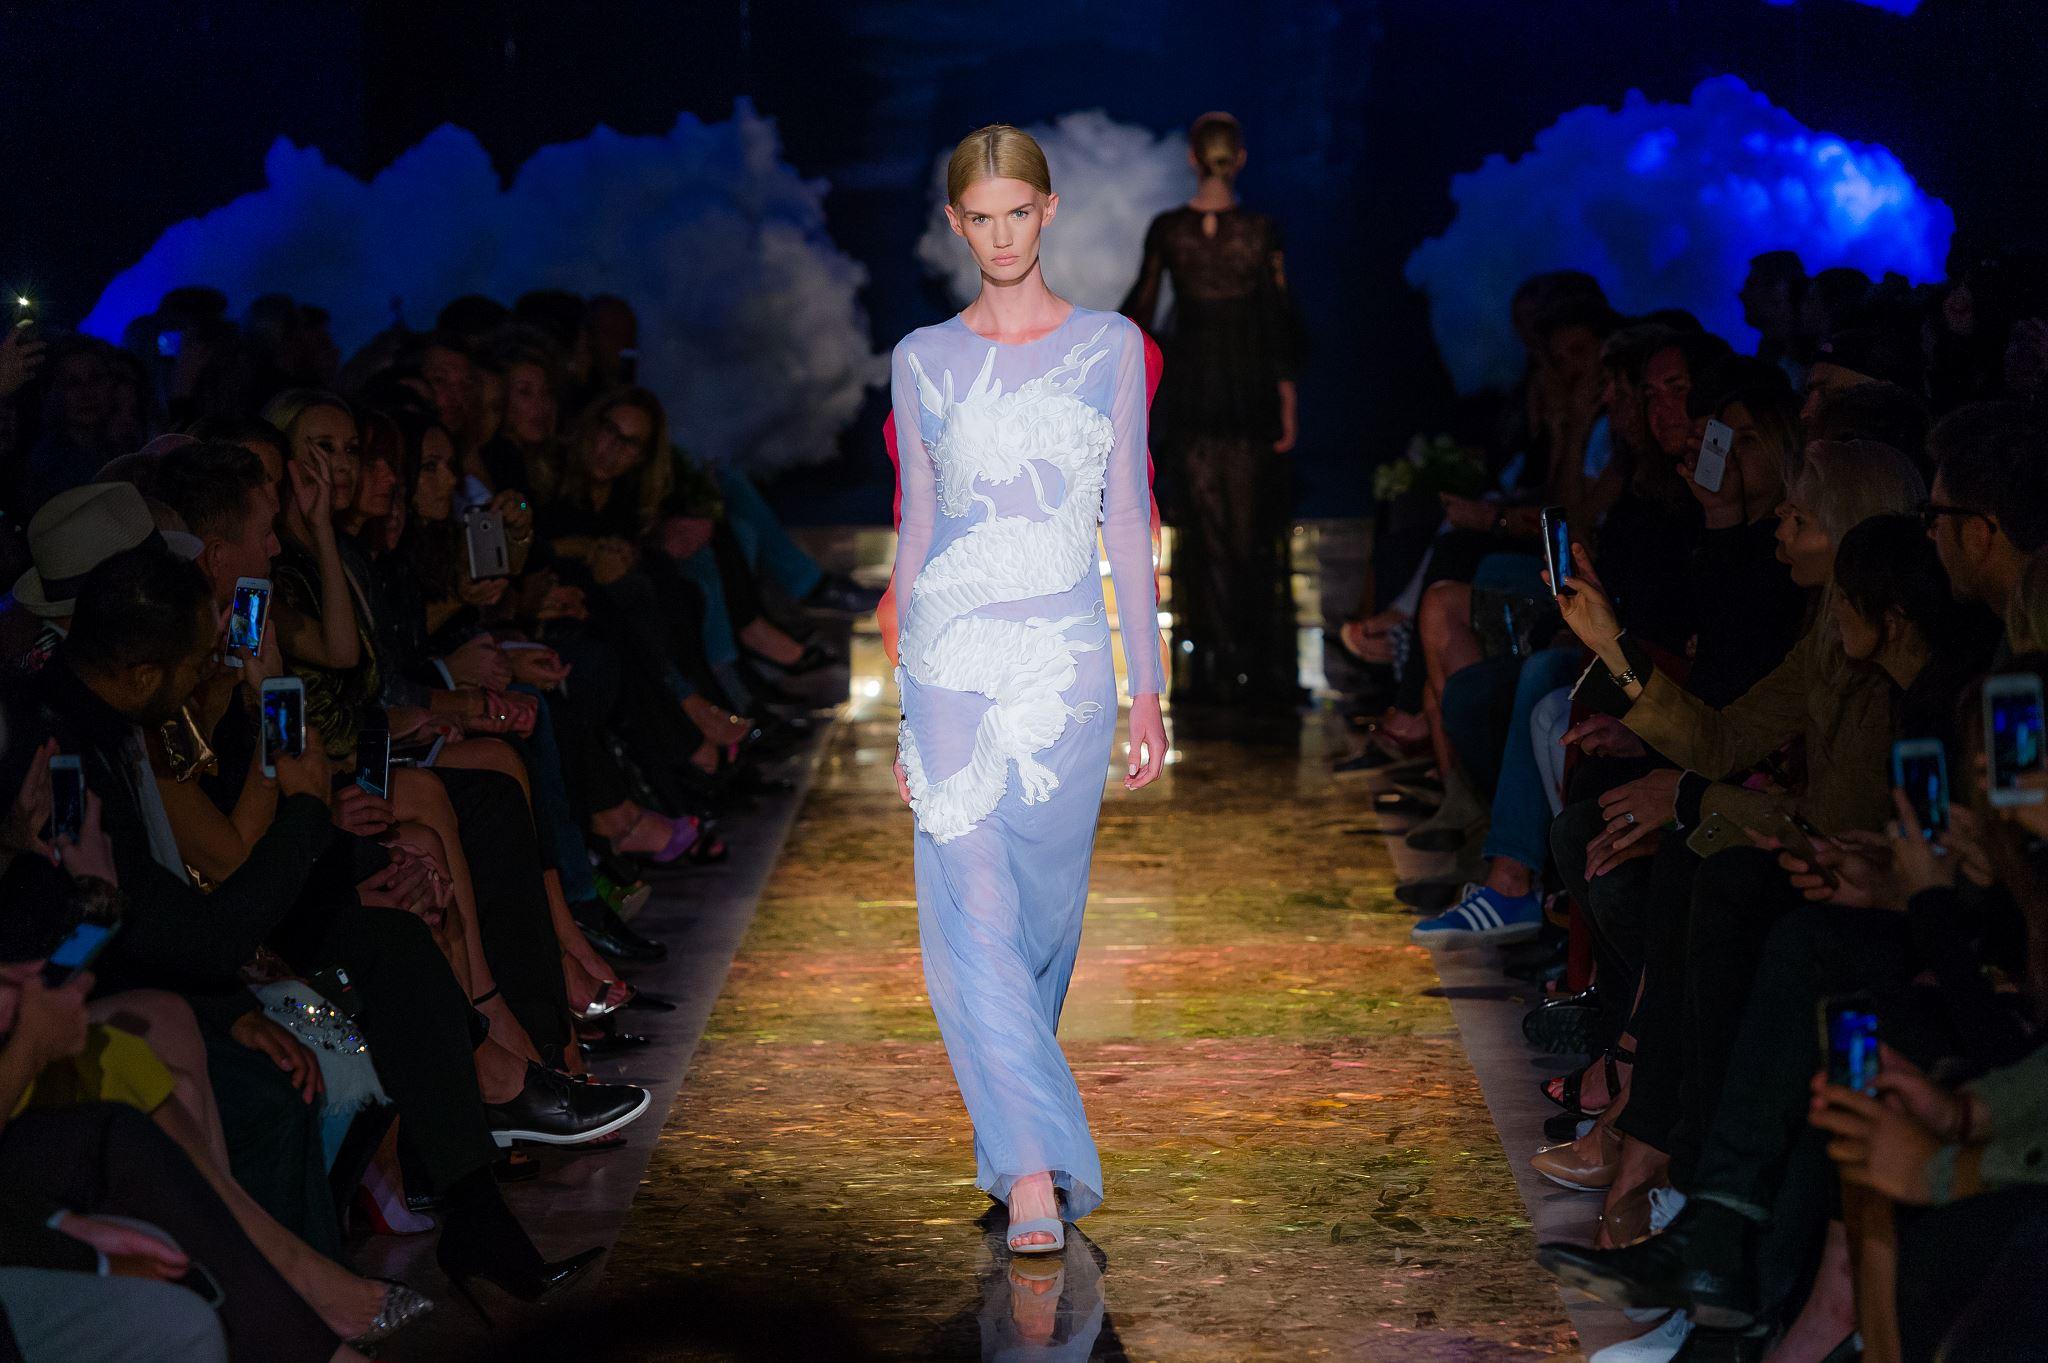 94_maciejzien_190916_web_fot_andrzej_marchwinski_fashion_images